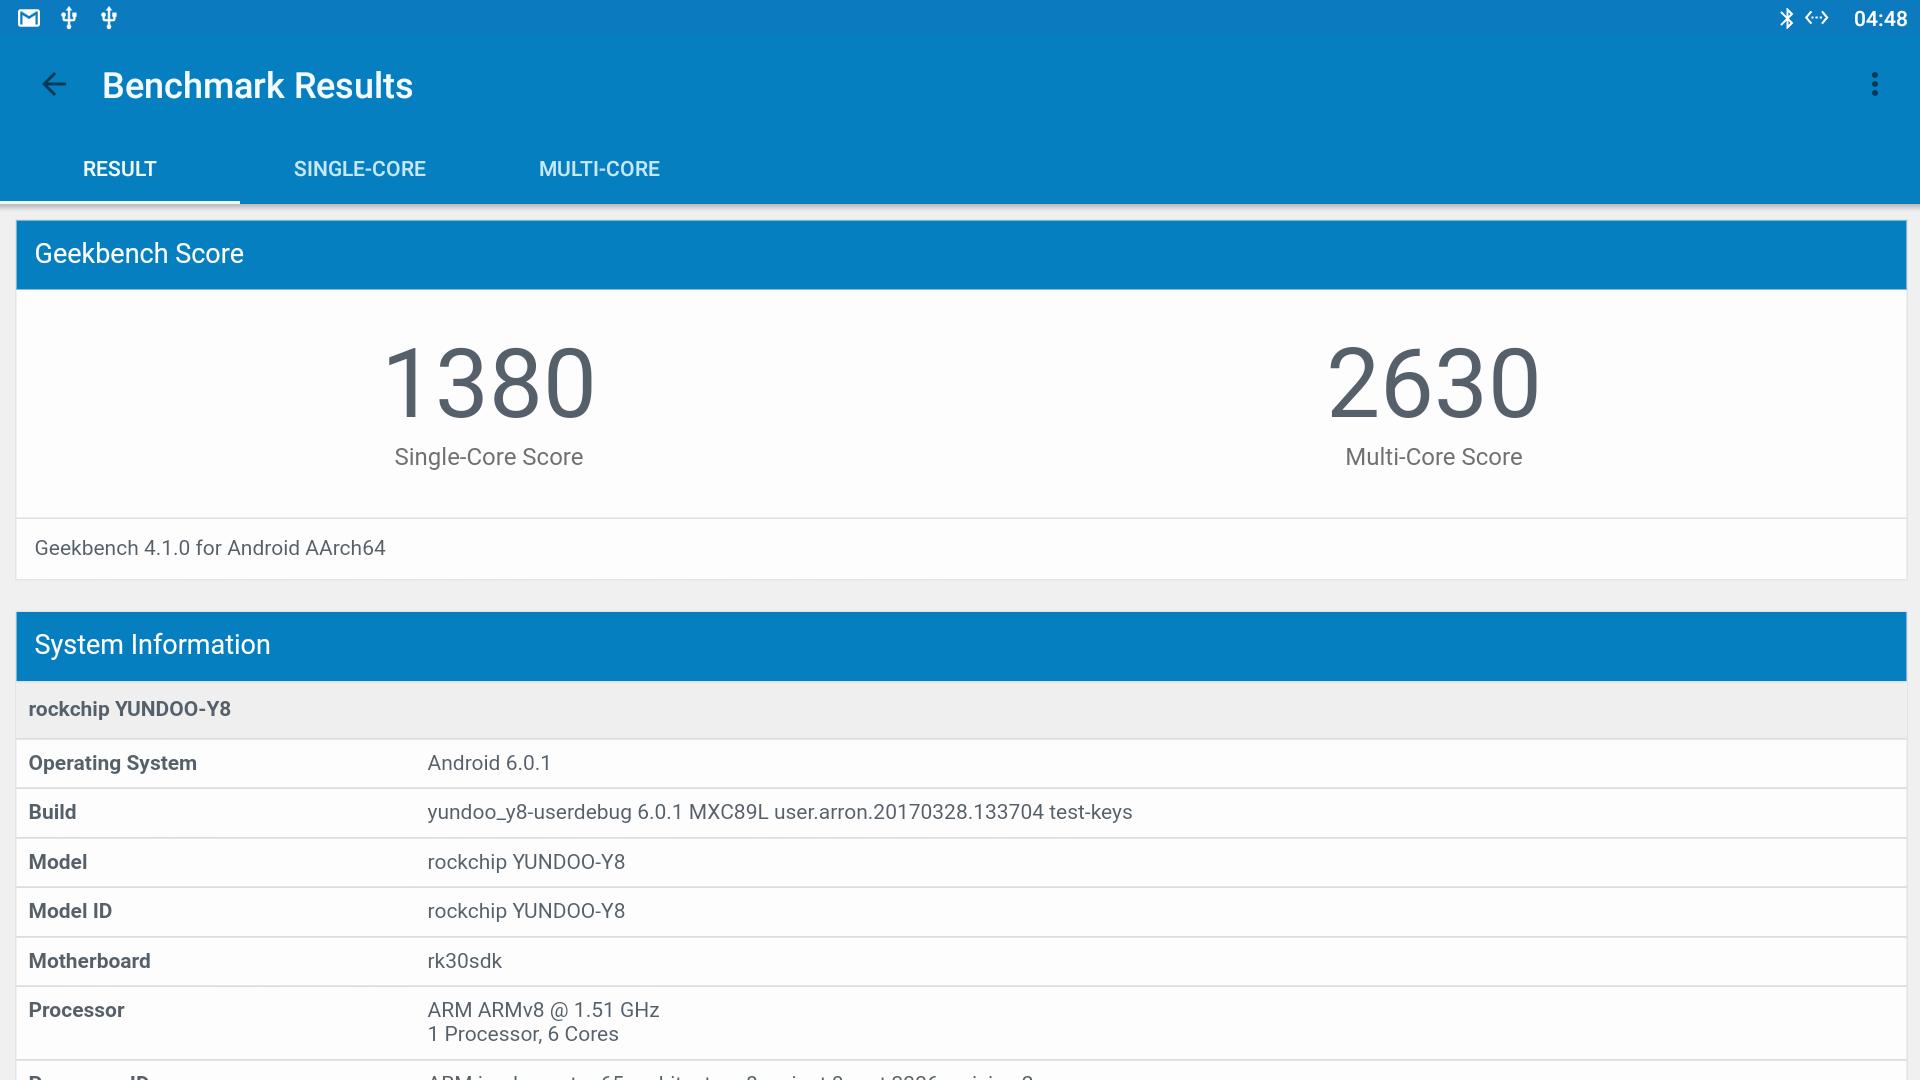 Yundoo Y8 Rockchip Rk3399 Tv Box System Info And Benchmarks